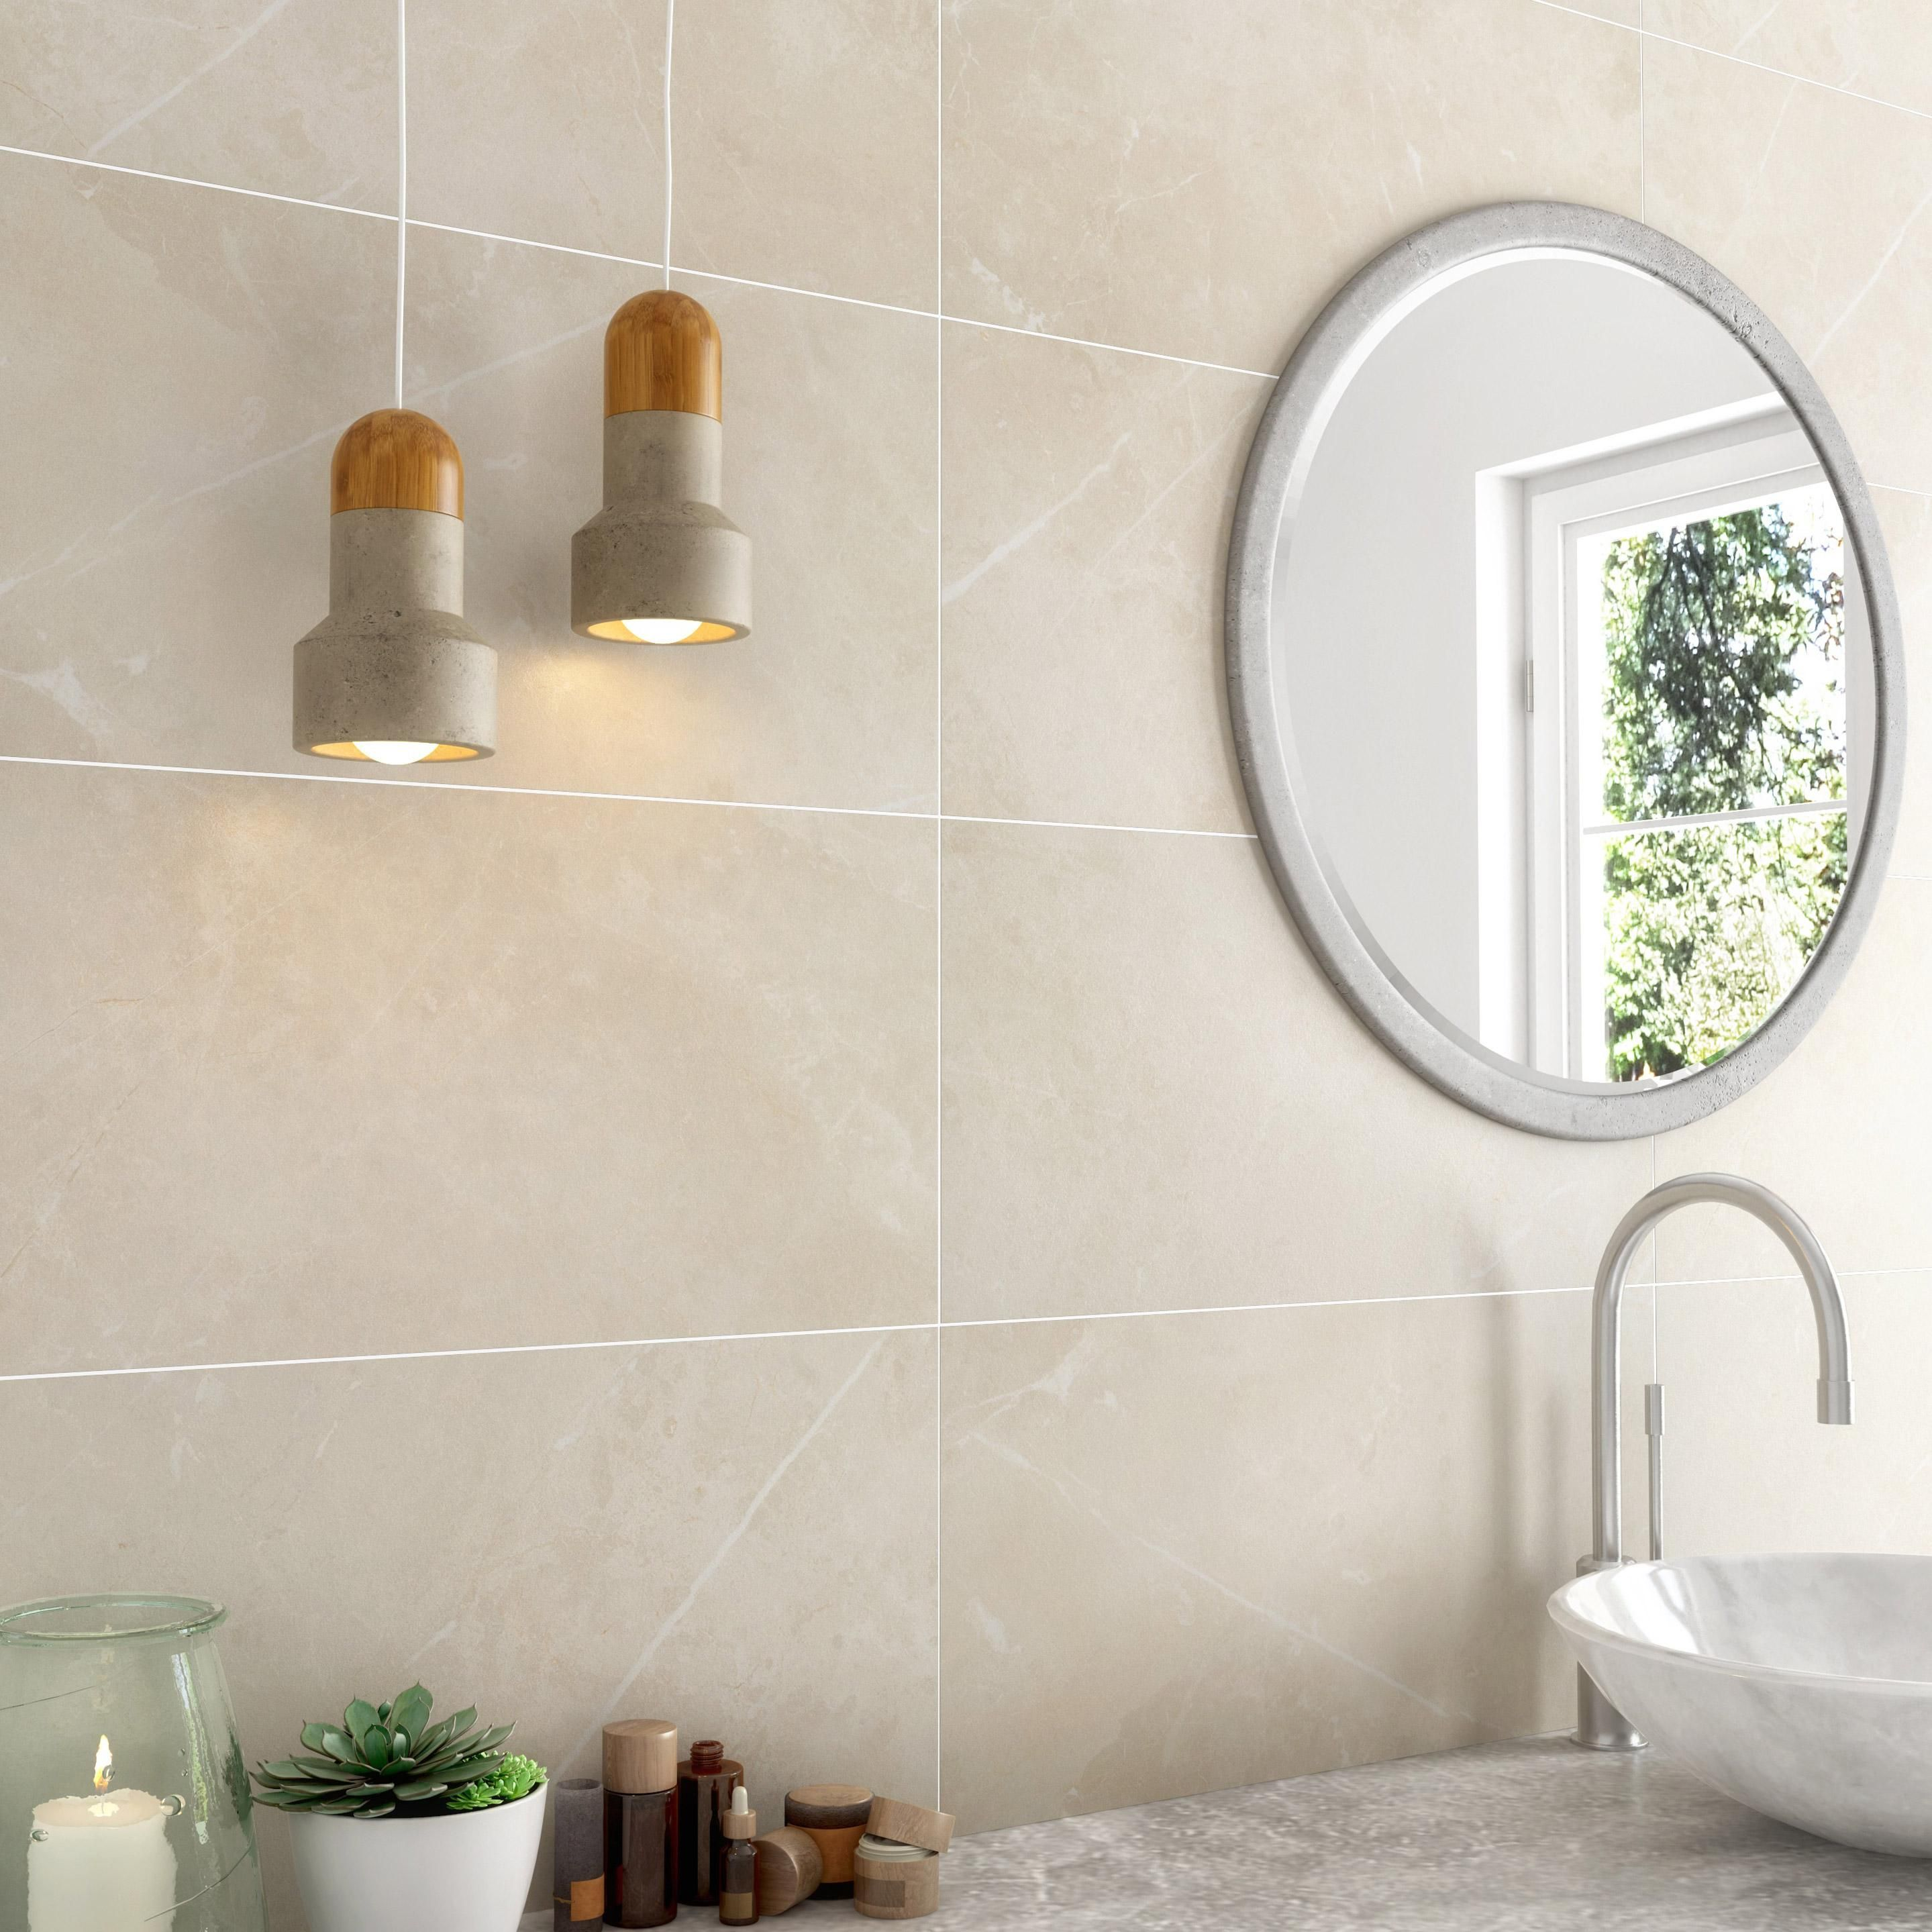 Epingle Sur Bathroom Ideas